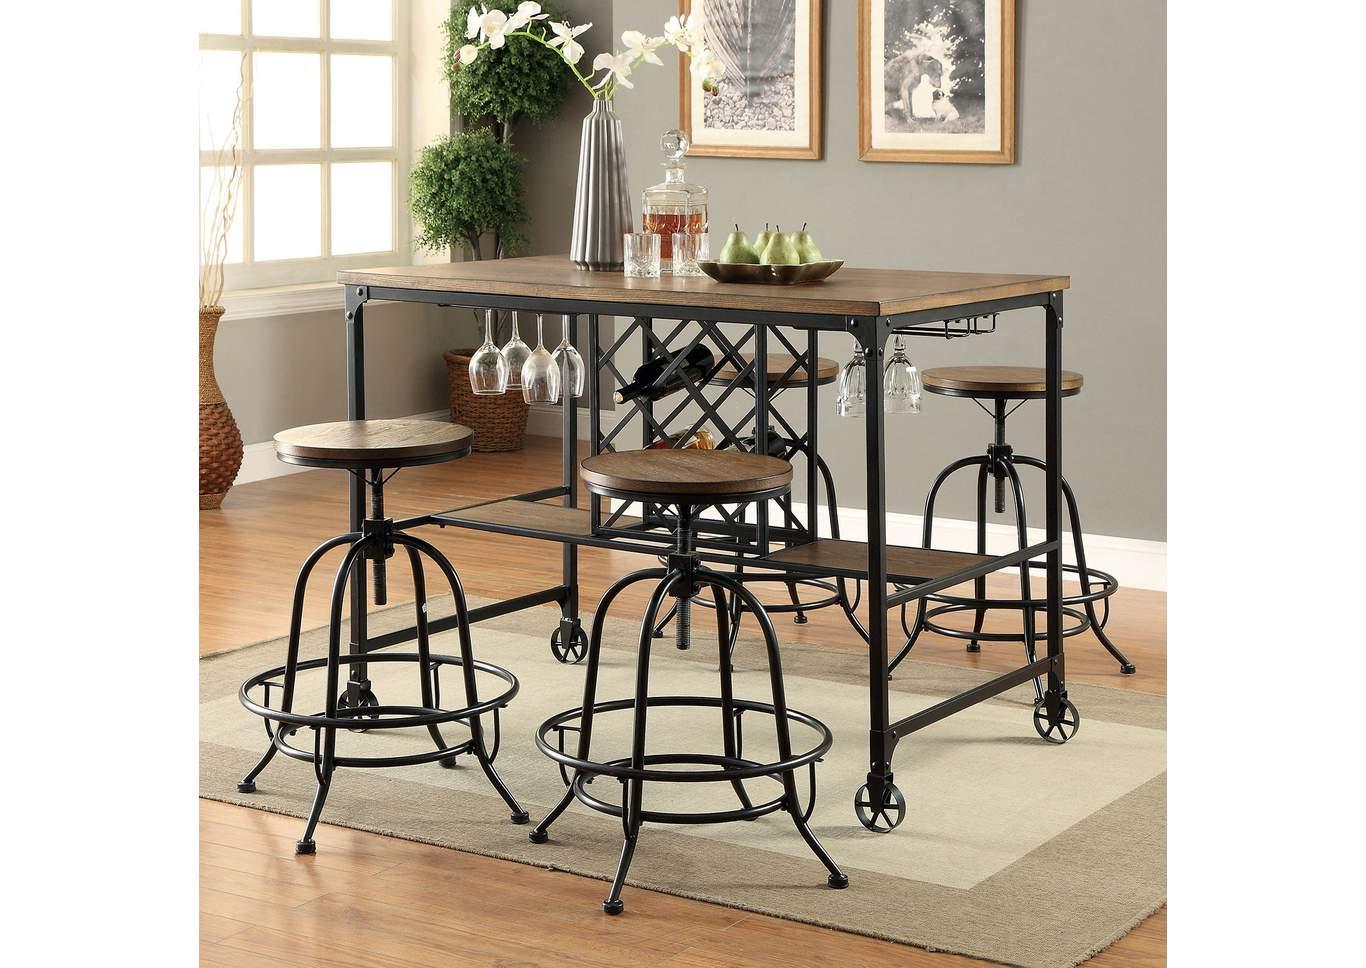 Remarkable 22 Furniture Gallery Silvia Medium Oak Counter Height Table Lamtechconsult Wood Chair Design Ideas Lamtechconsultcom